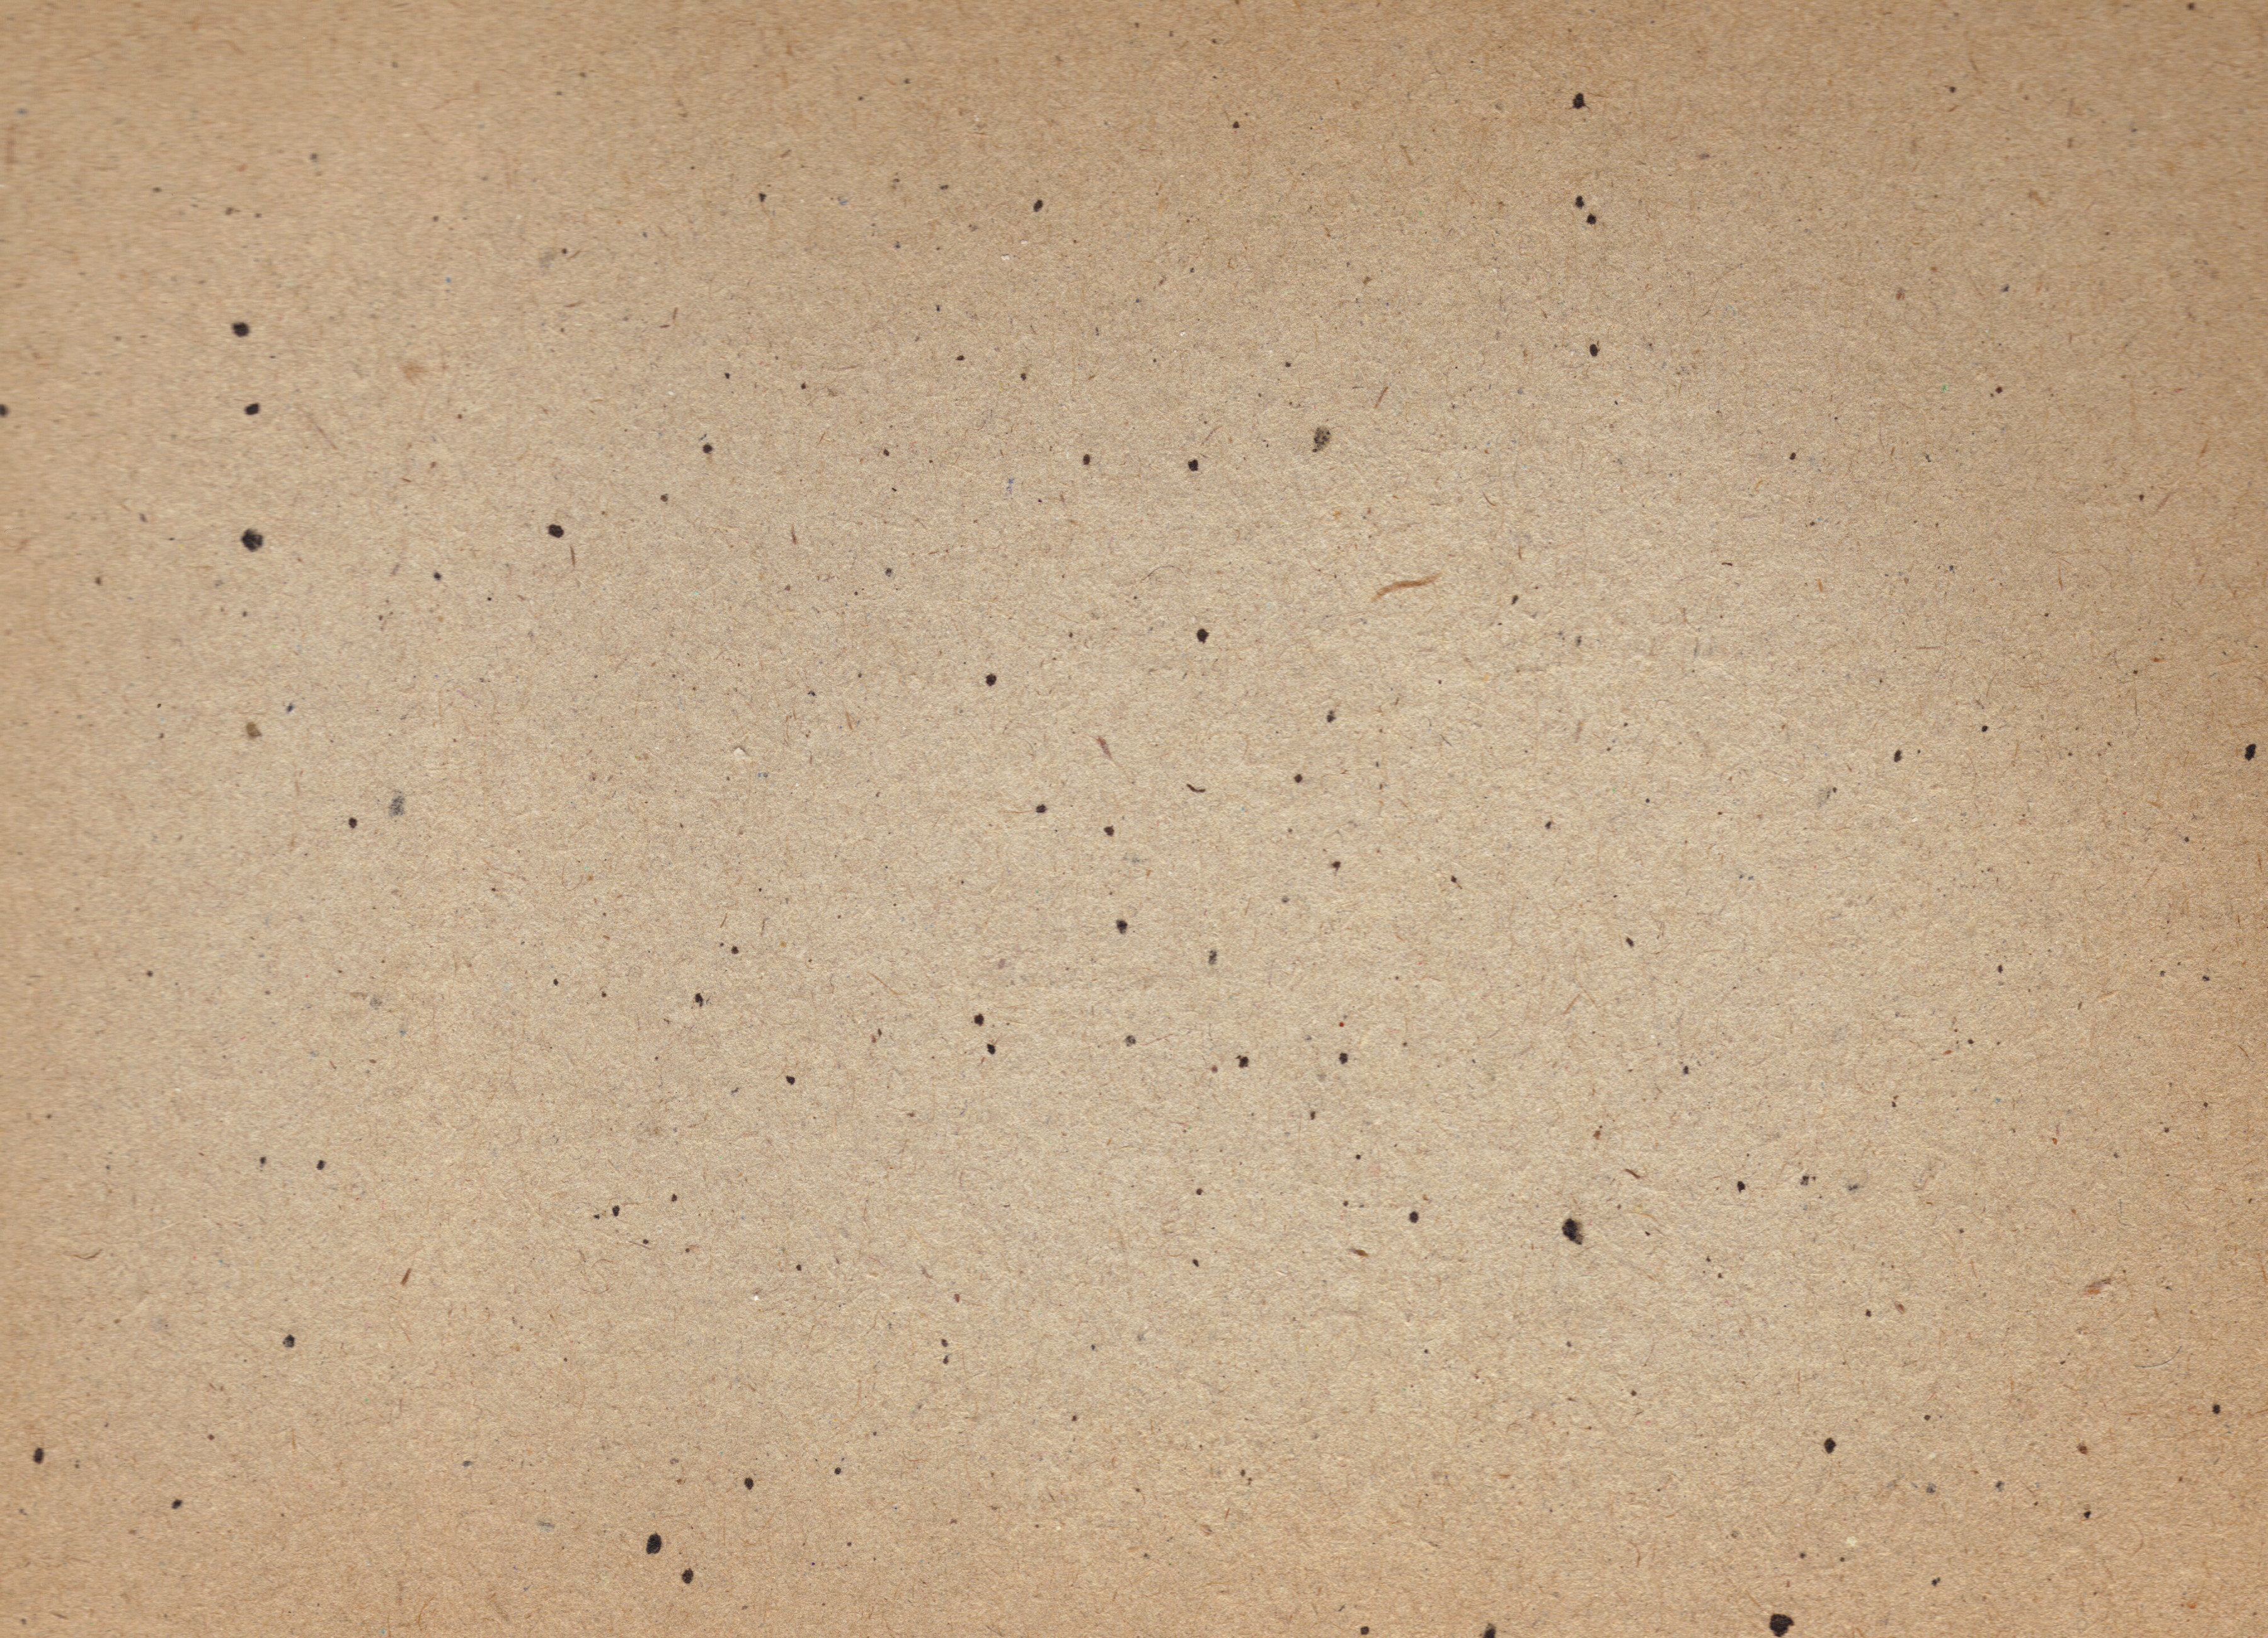 10 Cardboard Texture (JPG) | OnlyGFX.com